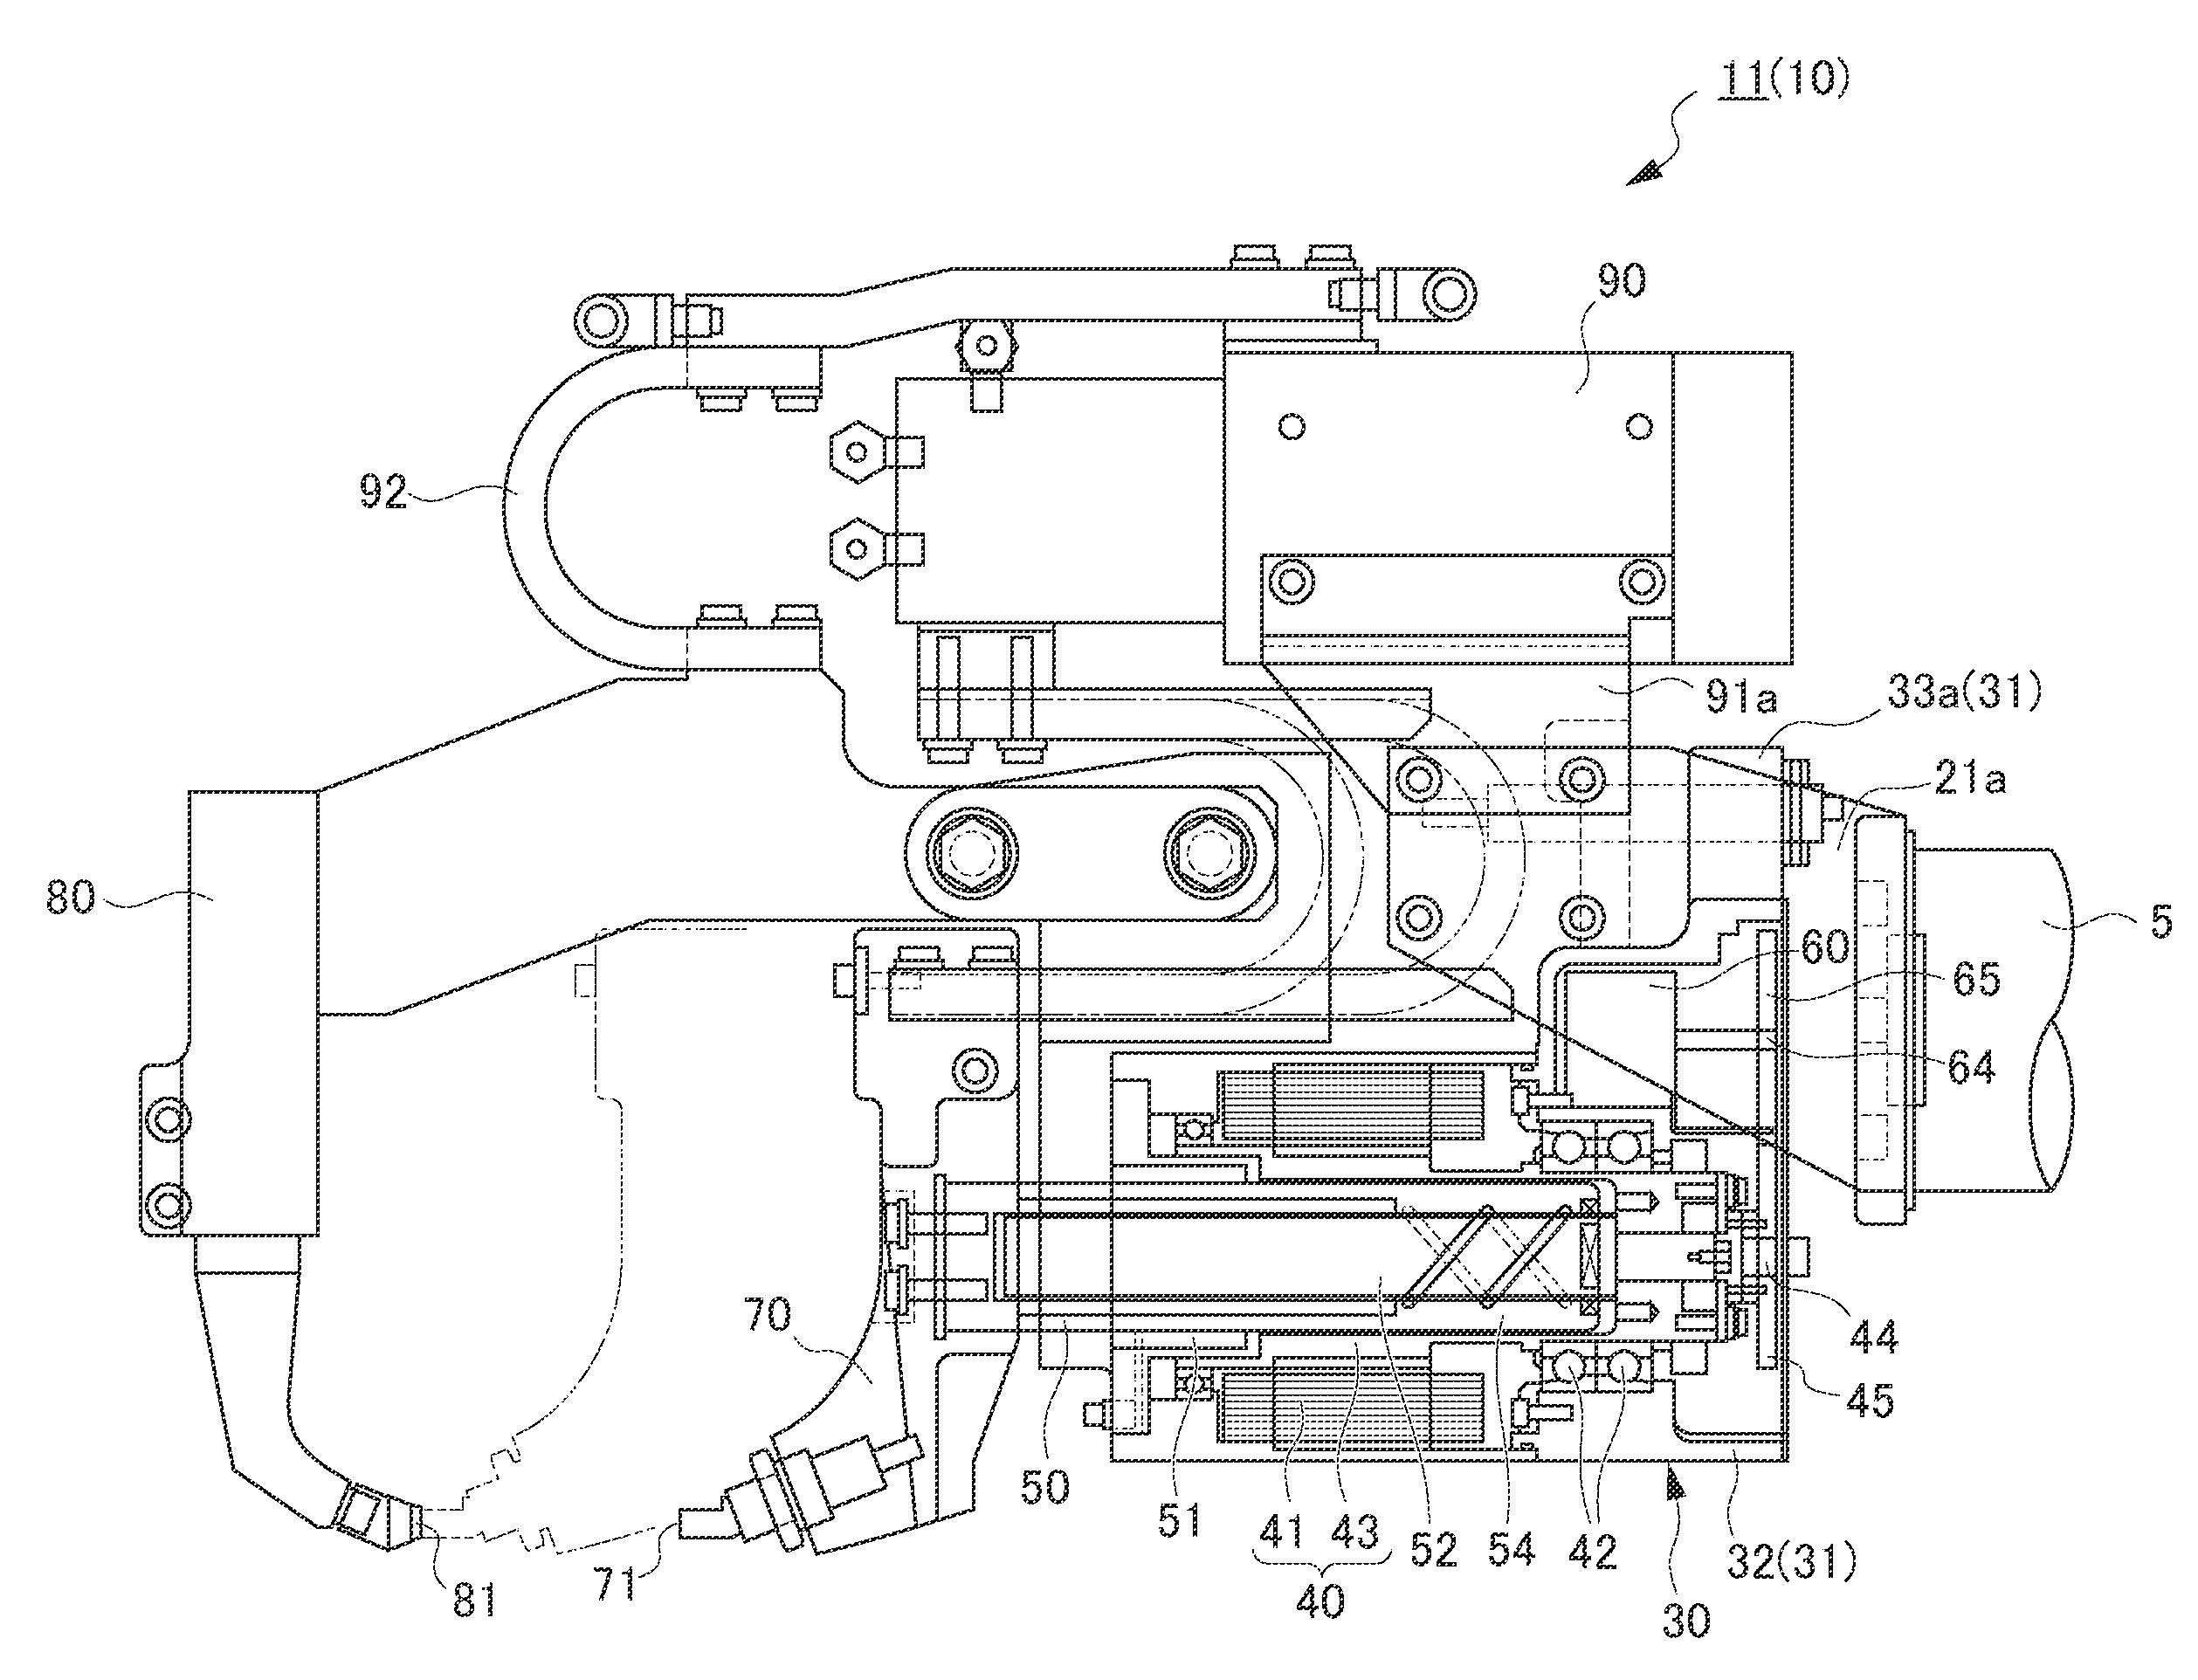 patent us20120031884 - electric spot welding gun